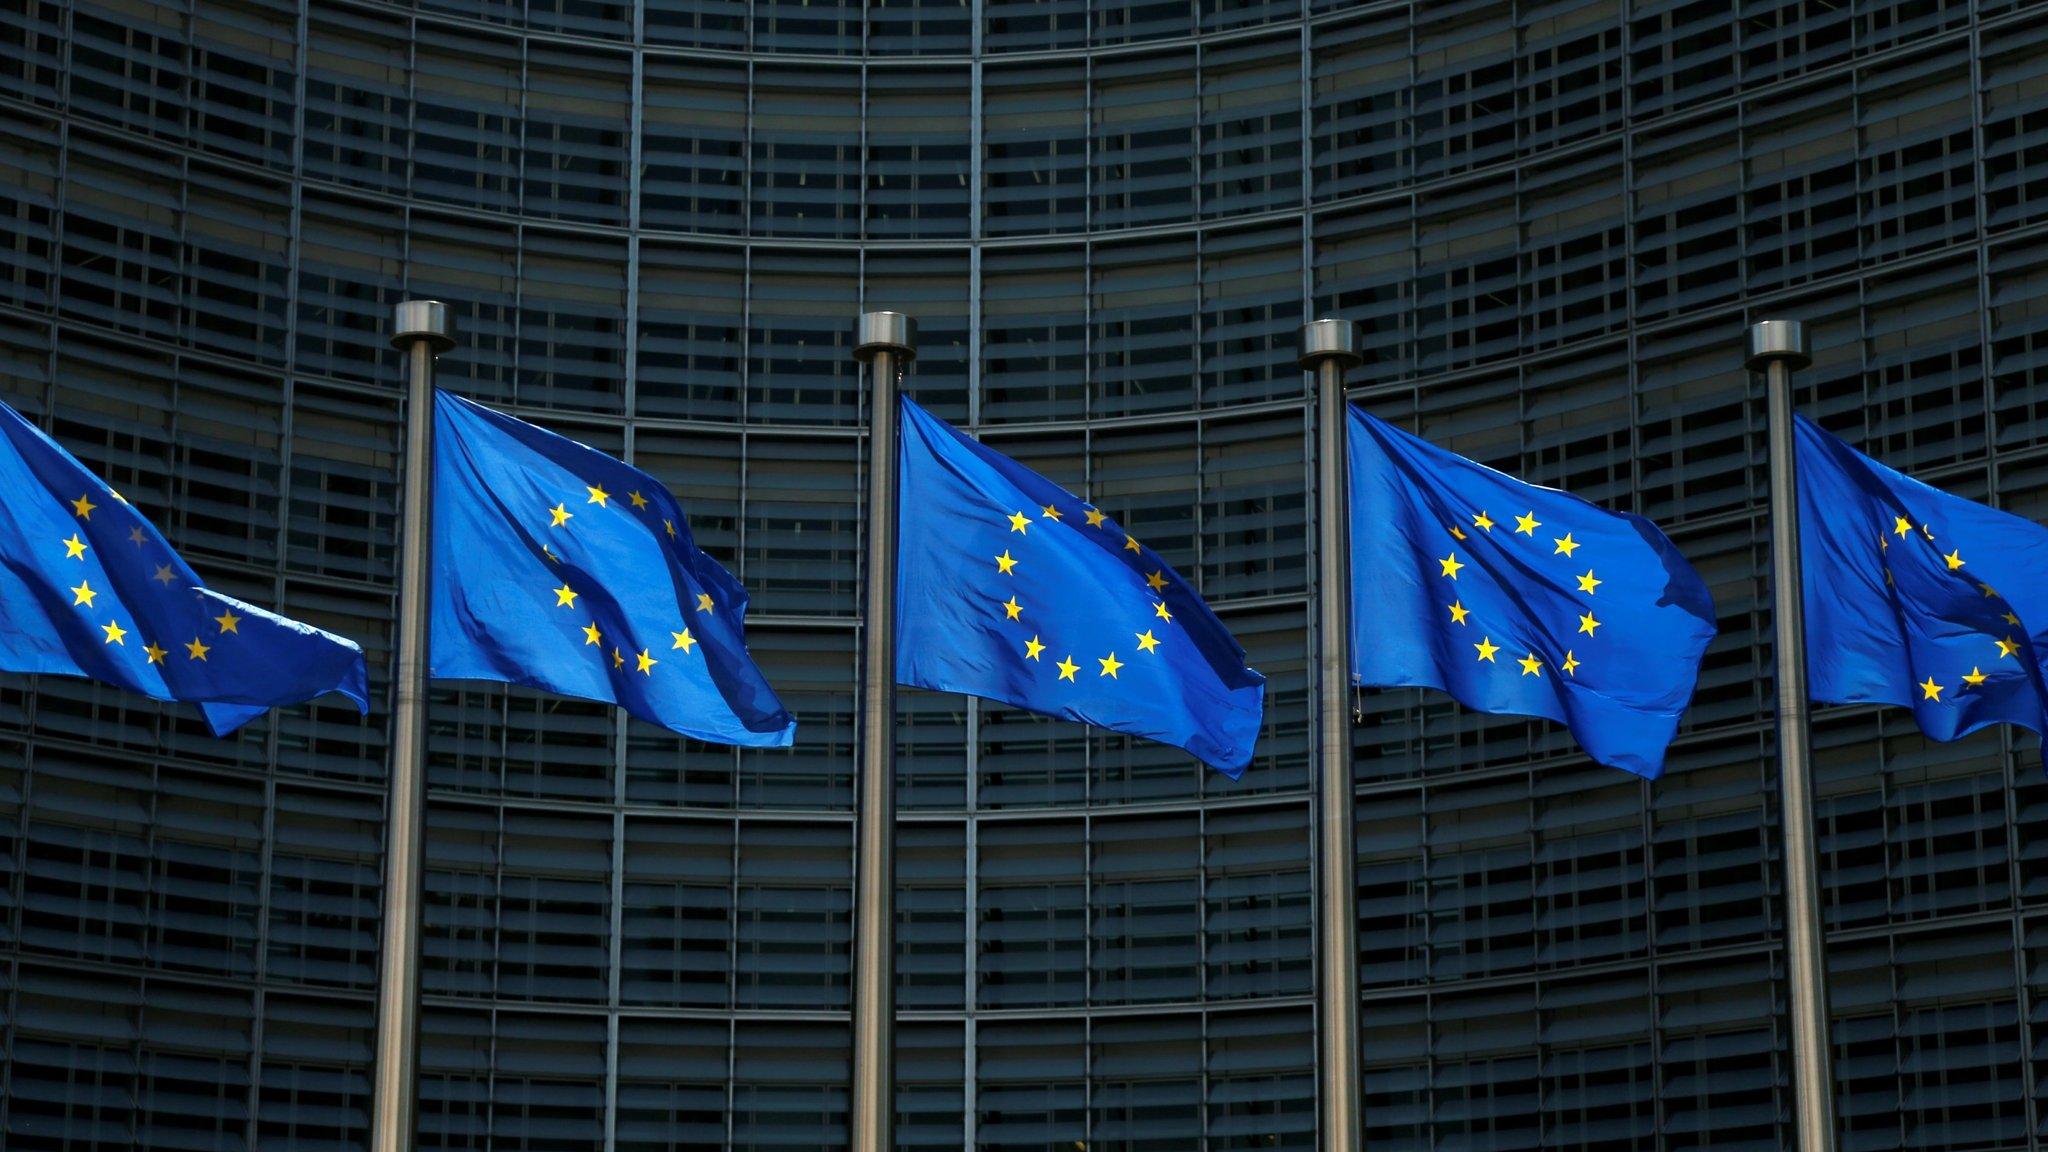 EU seeks powers to stop post-Brexit bonfire of regulation